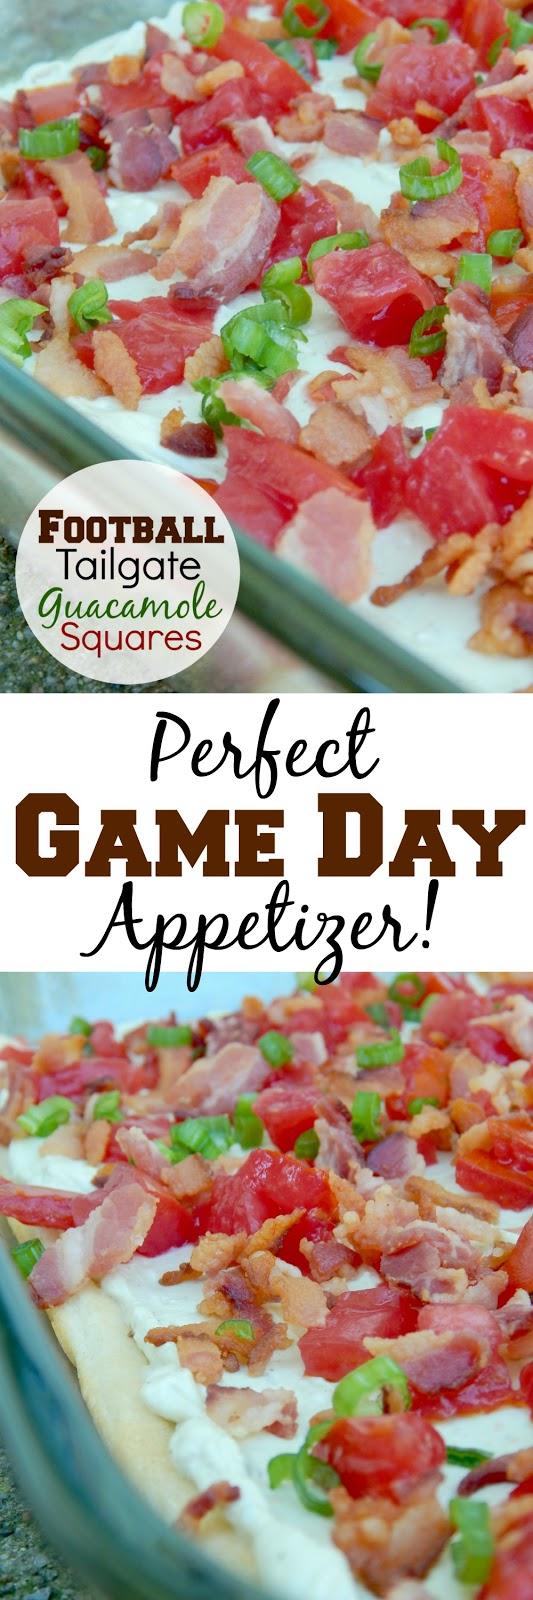 football tailgate guacamole squares (sweetandsavoryfood.com)